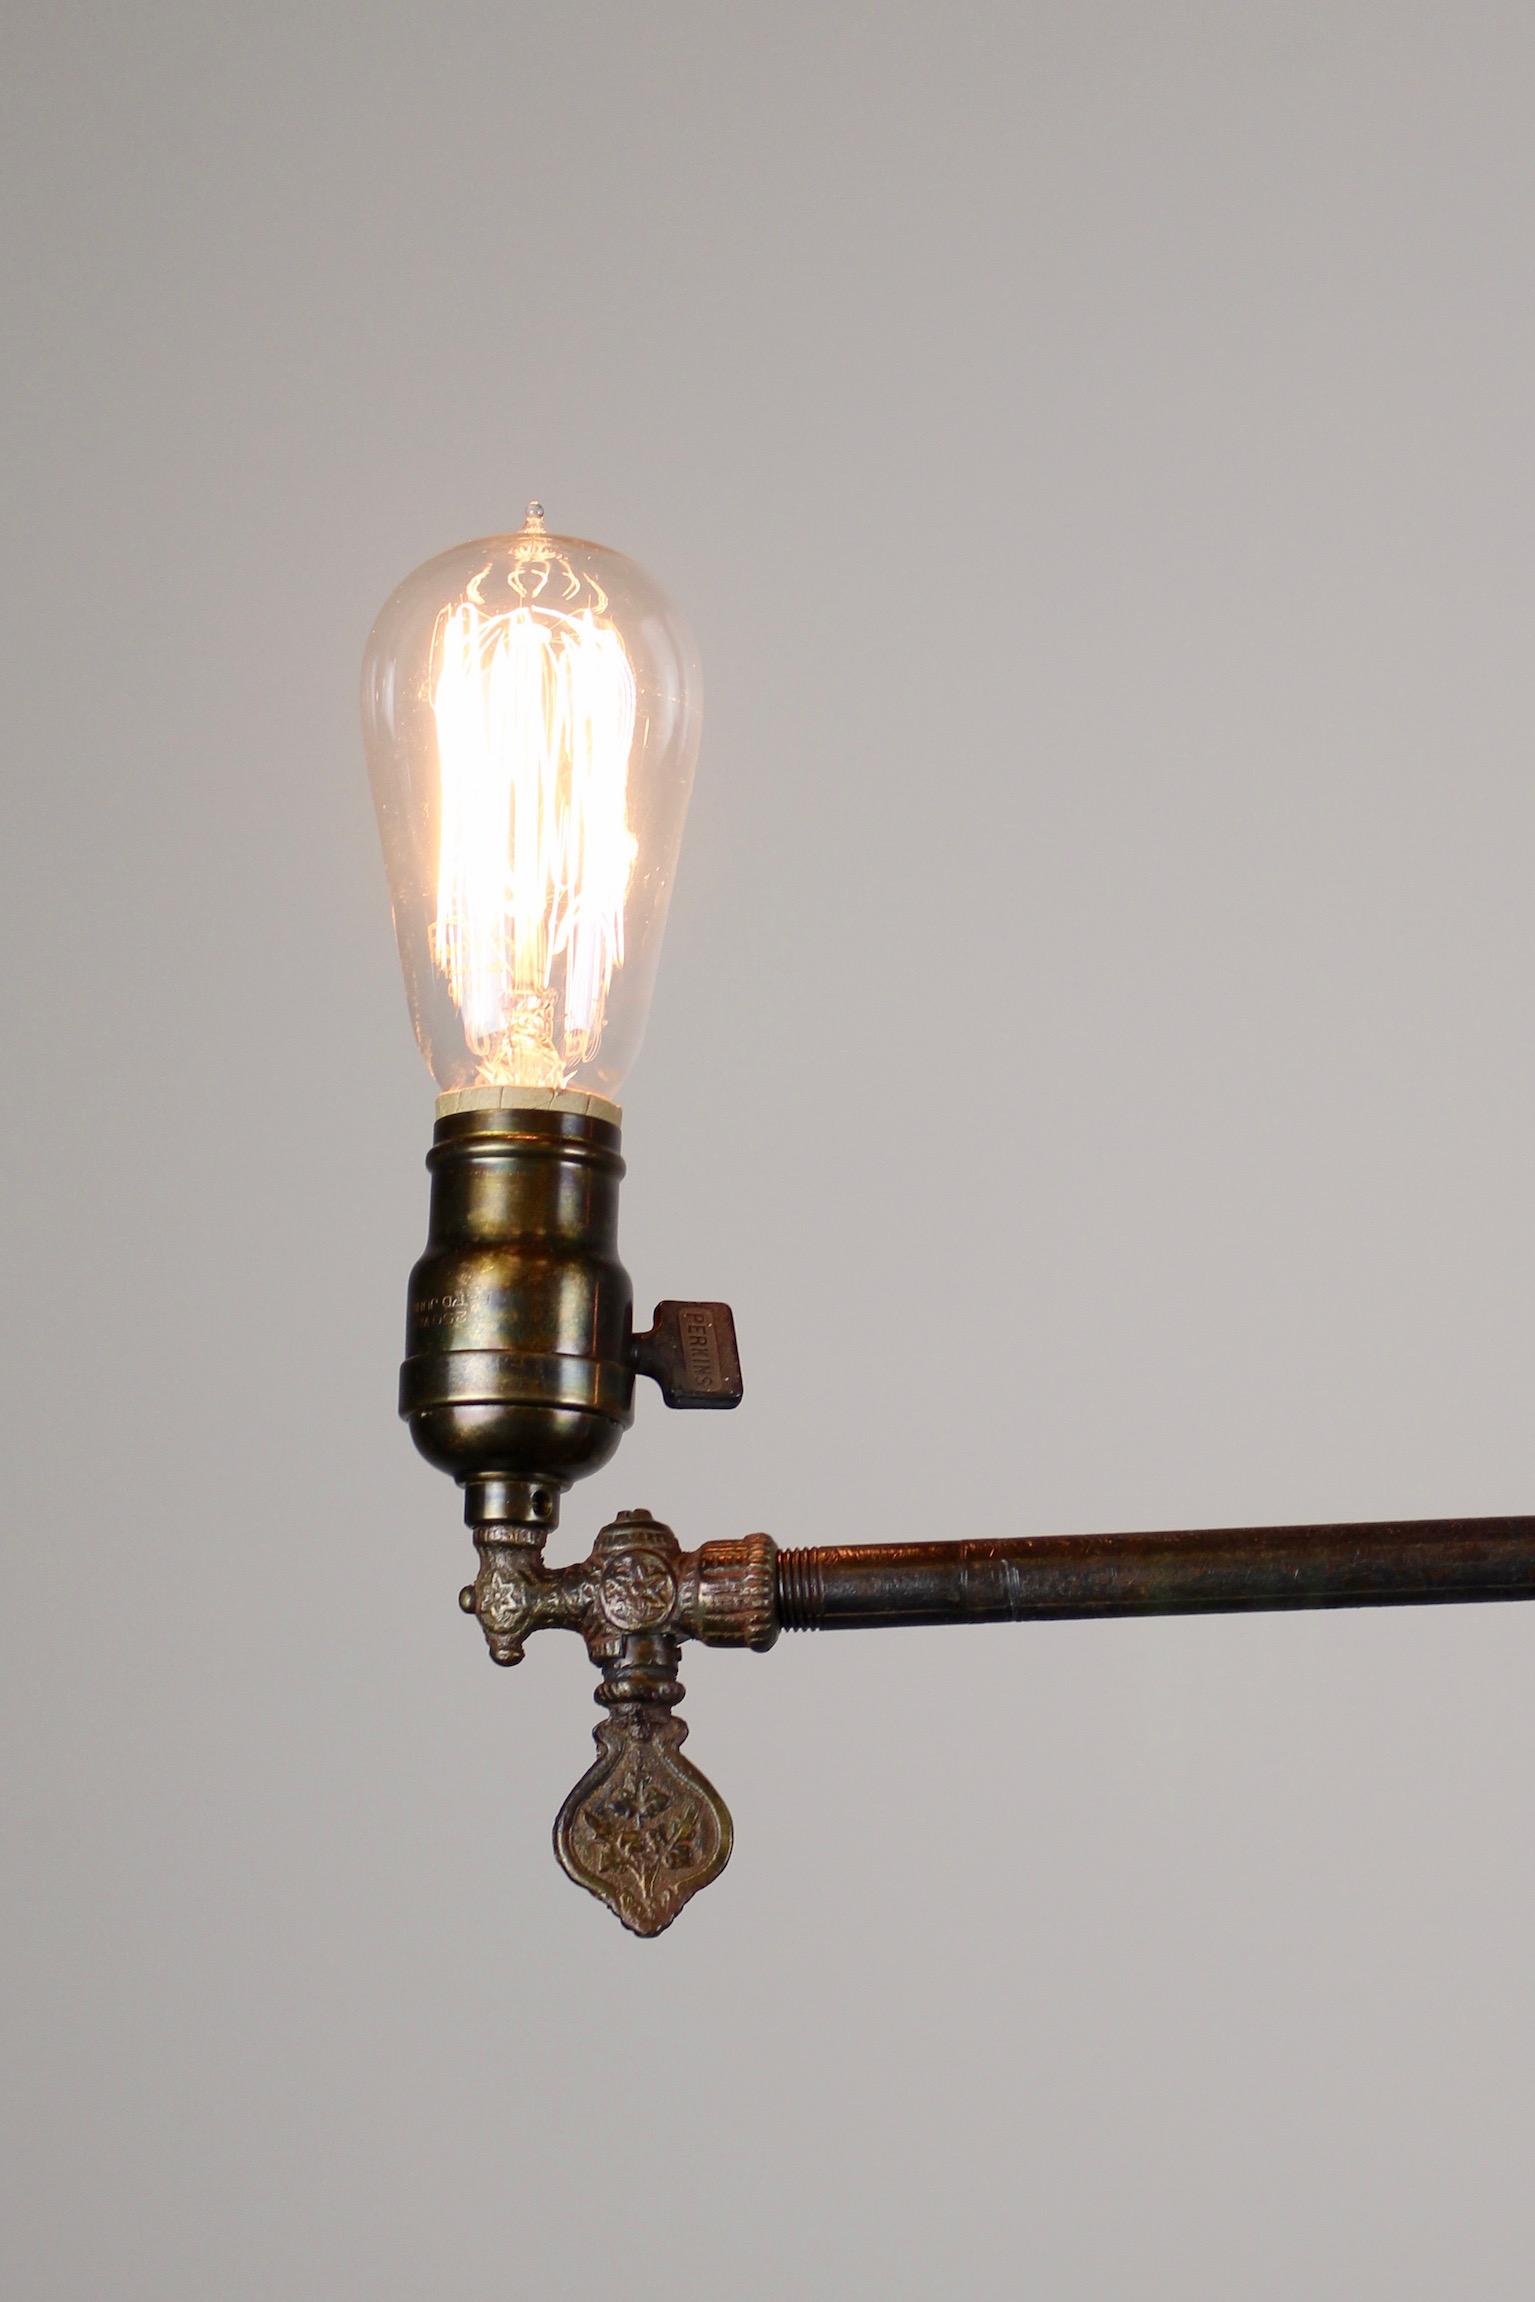 Original Industrial Gas Light Fixture Circa 1885 By Archer